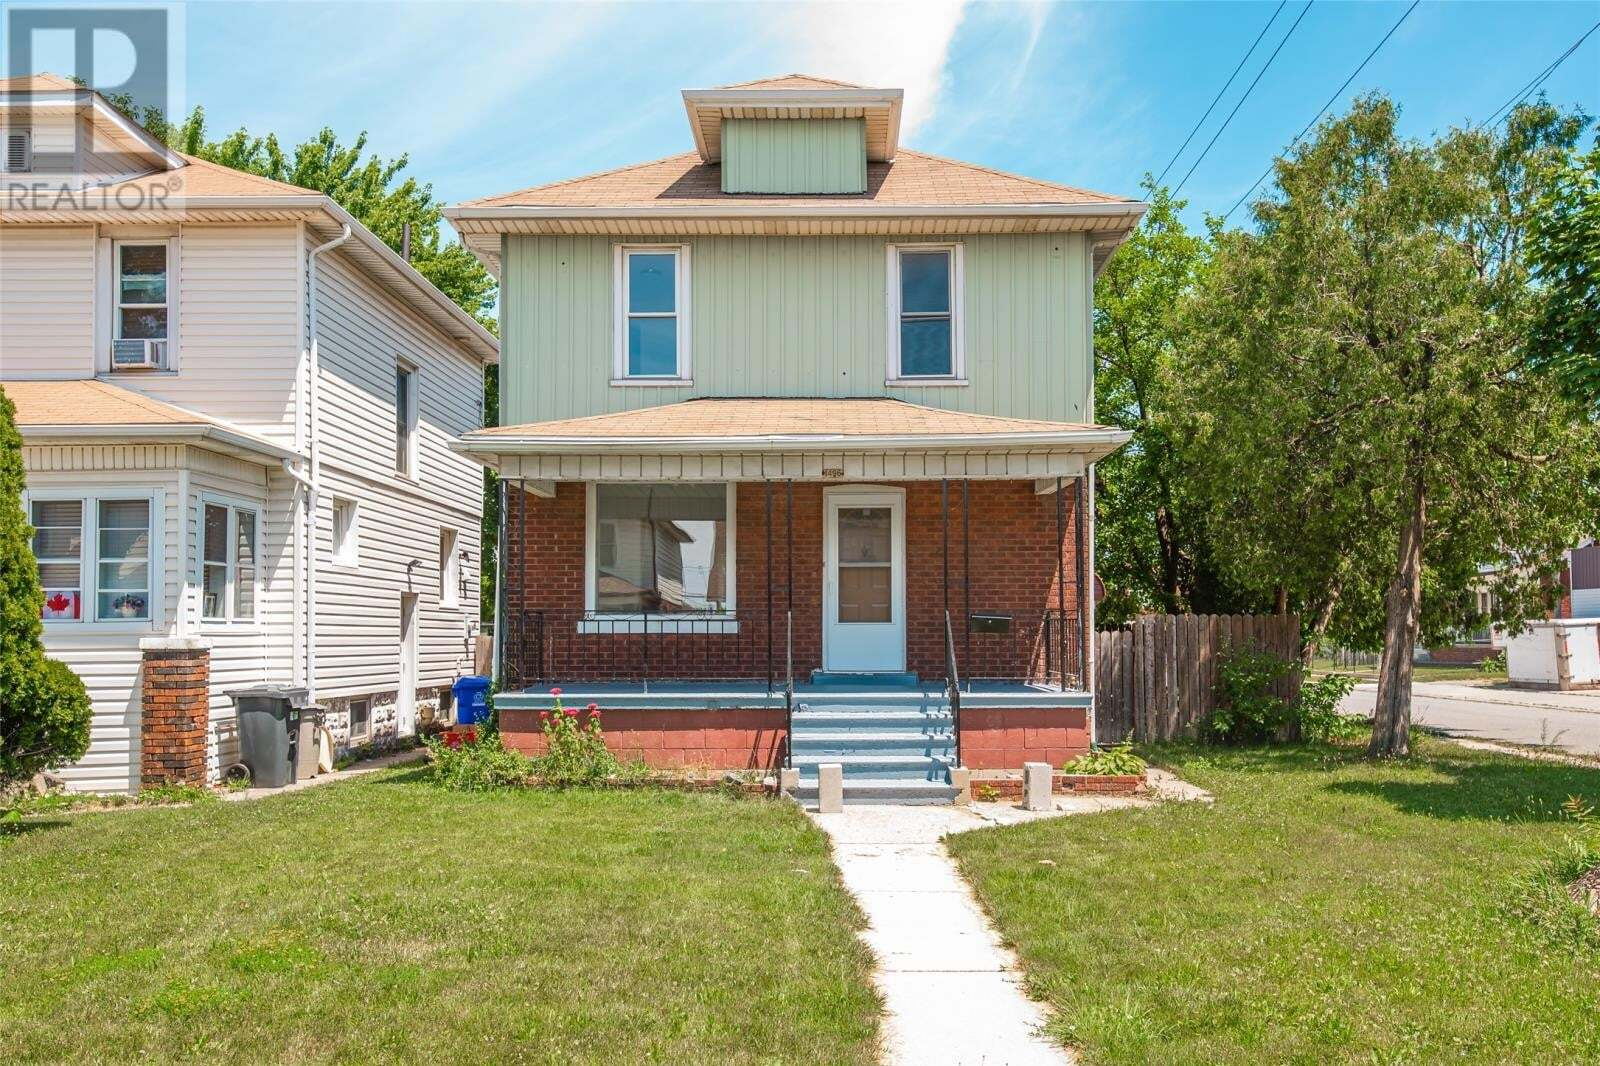 House for sale at 1496 Elsmere  Windsor Ontario - MLS: 20008232